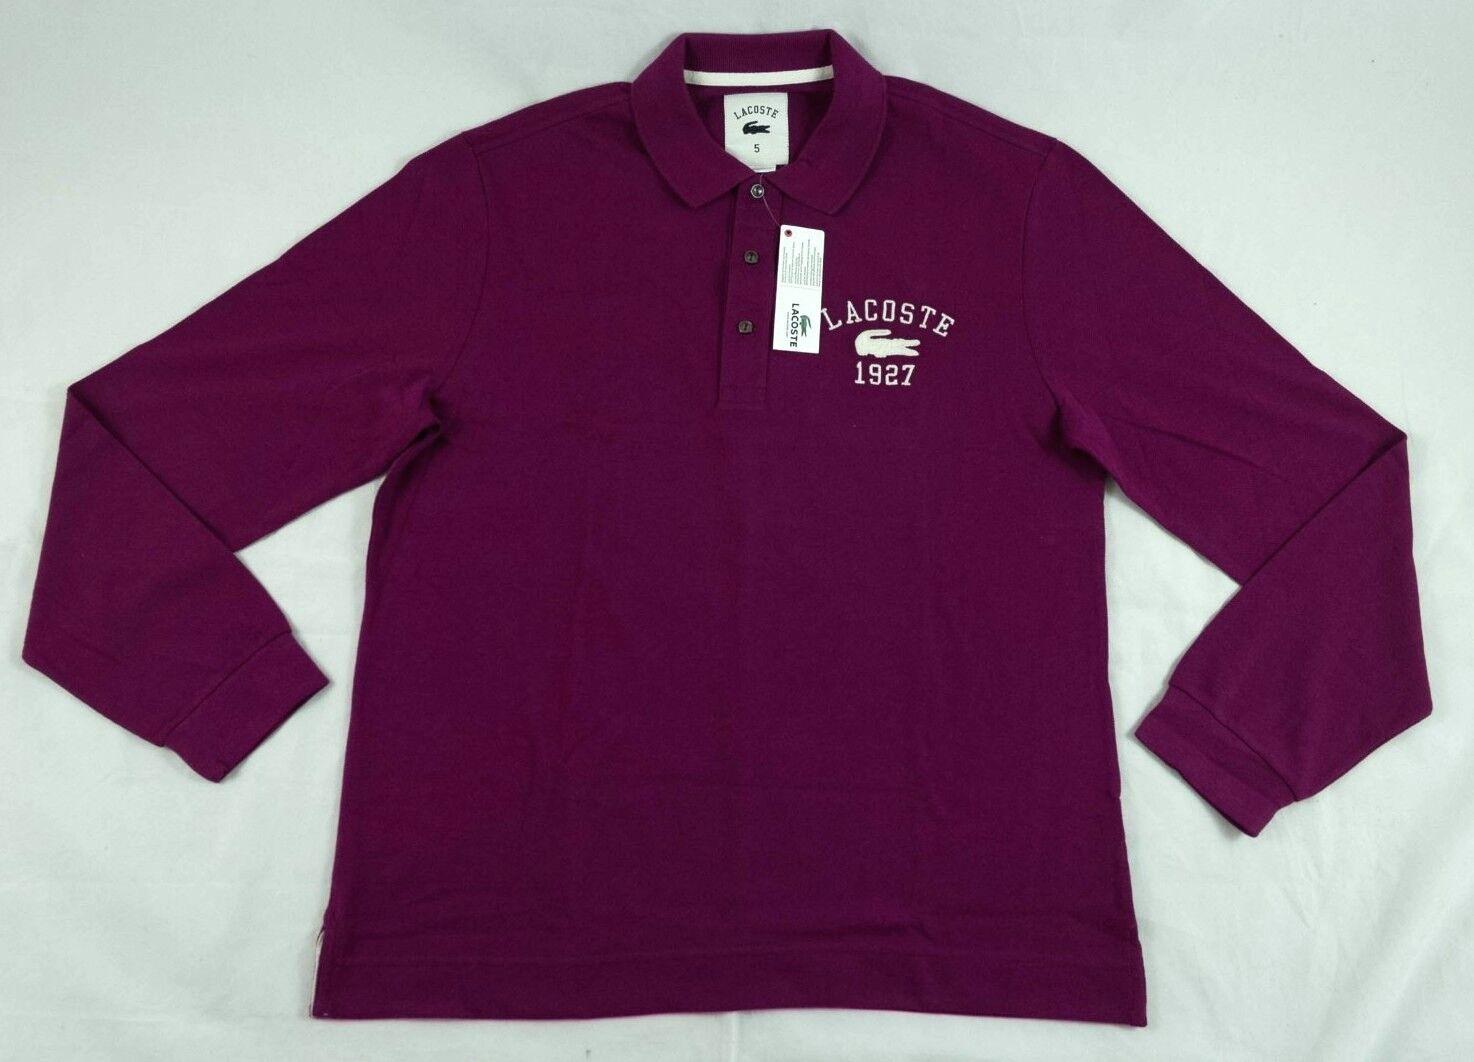 Lacoste lila Buttoned CollaROT Cotton Polo Sweatshirt Größe M 115 PH657D BNWT